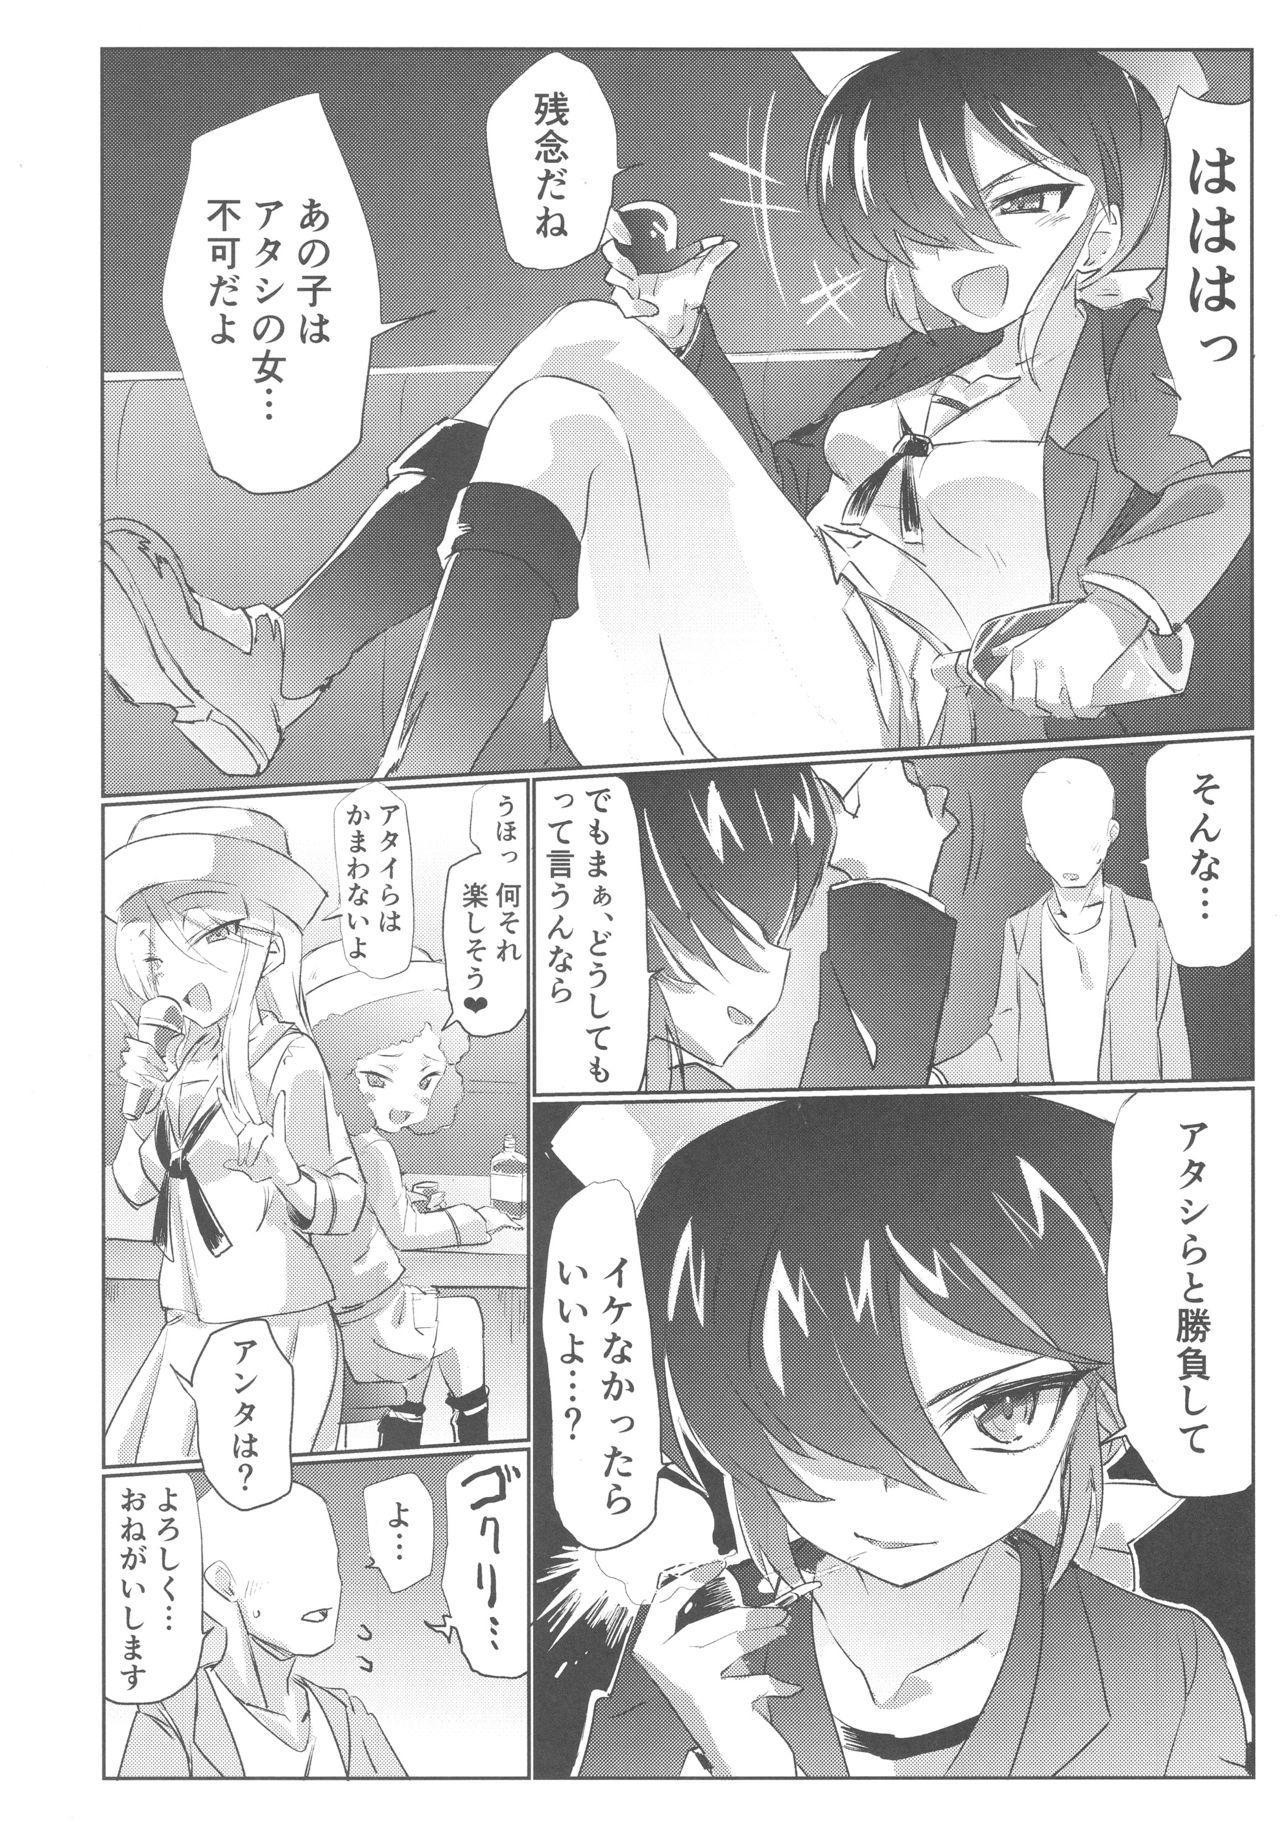 Mise ni Haittara Mazu Shimei Shina 4